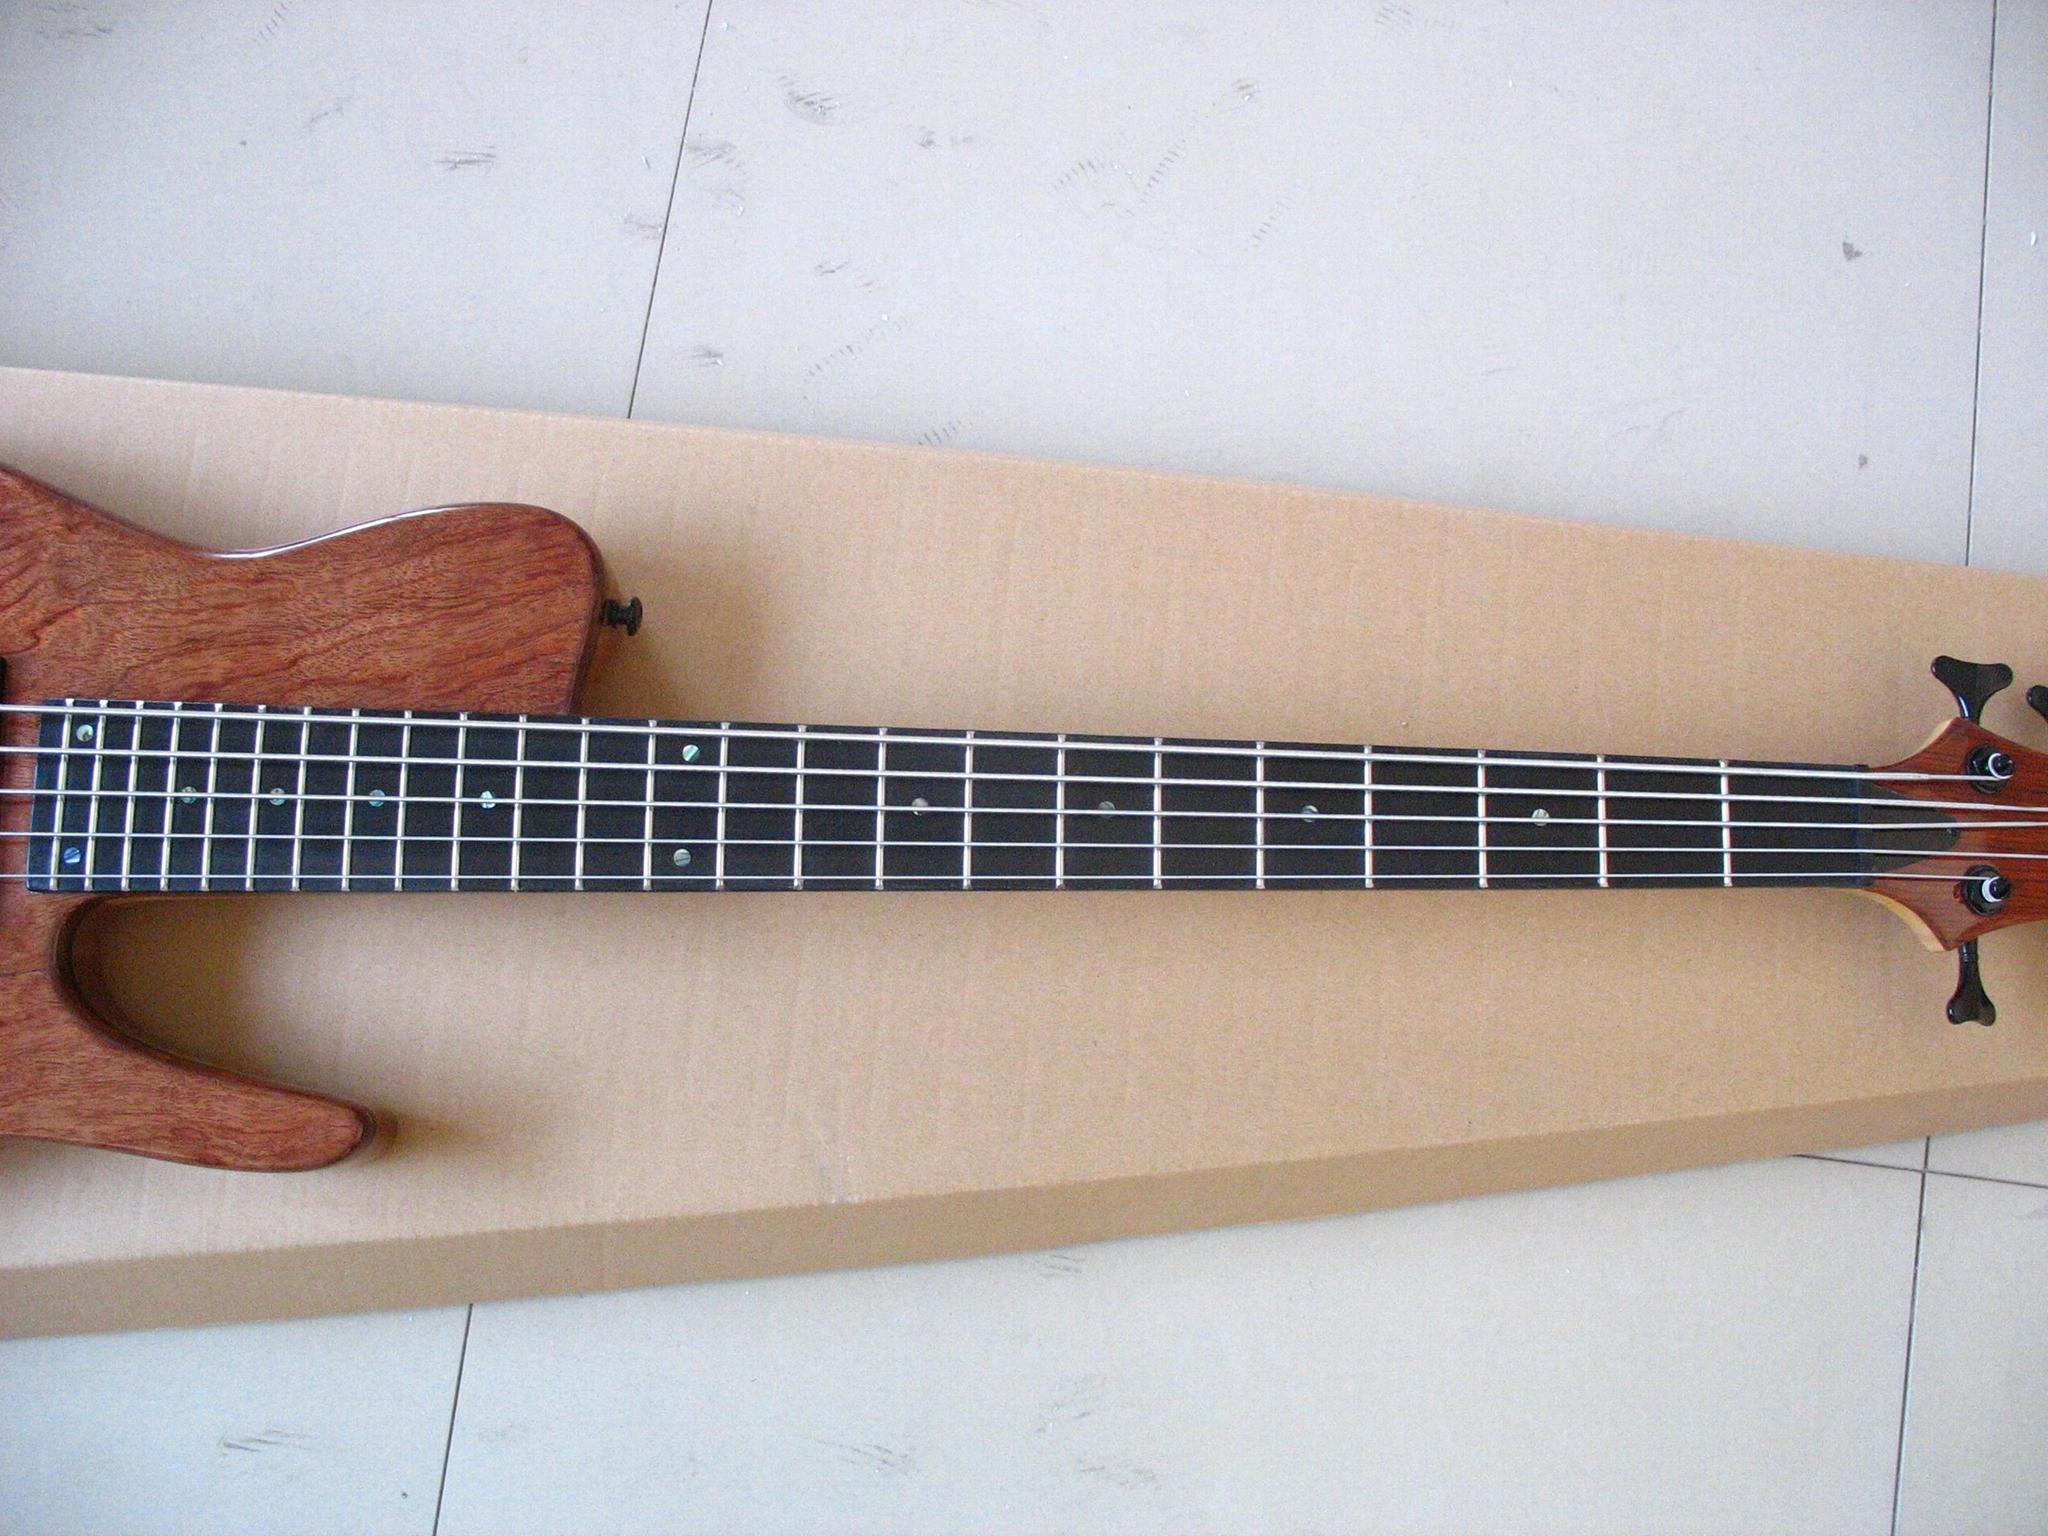 2020 Jingying Music Butterfly Electric Bass Guitars 6